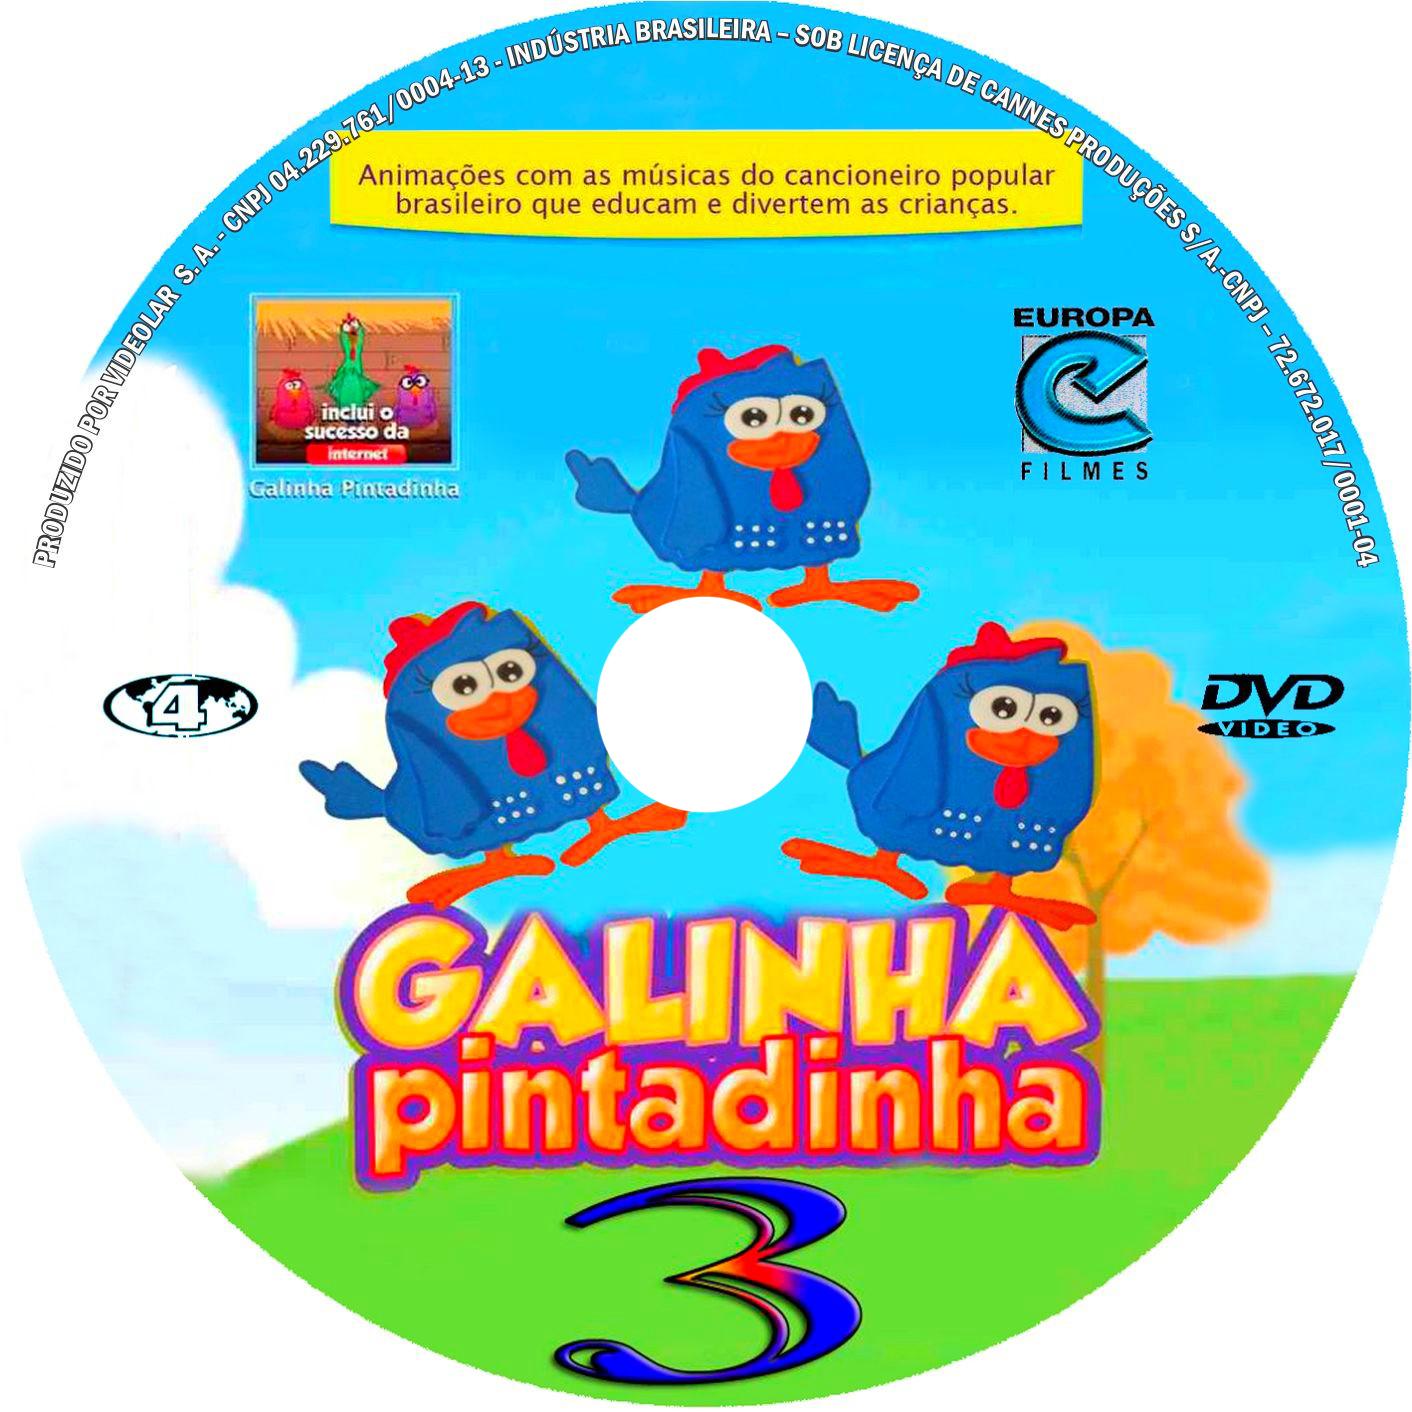 MANIACS 10000 BAIXAR DVD